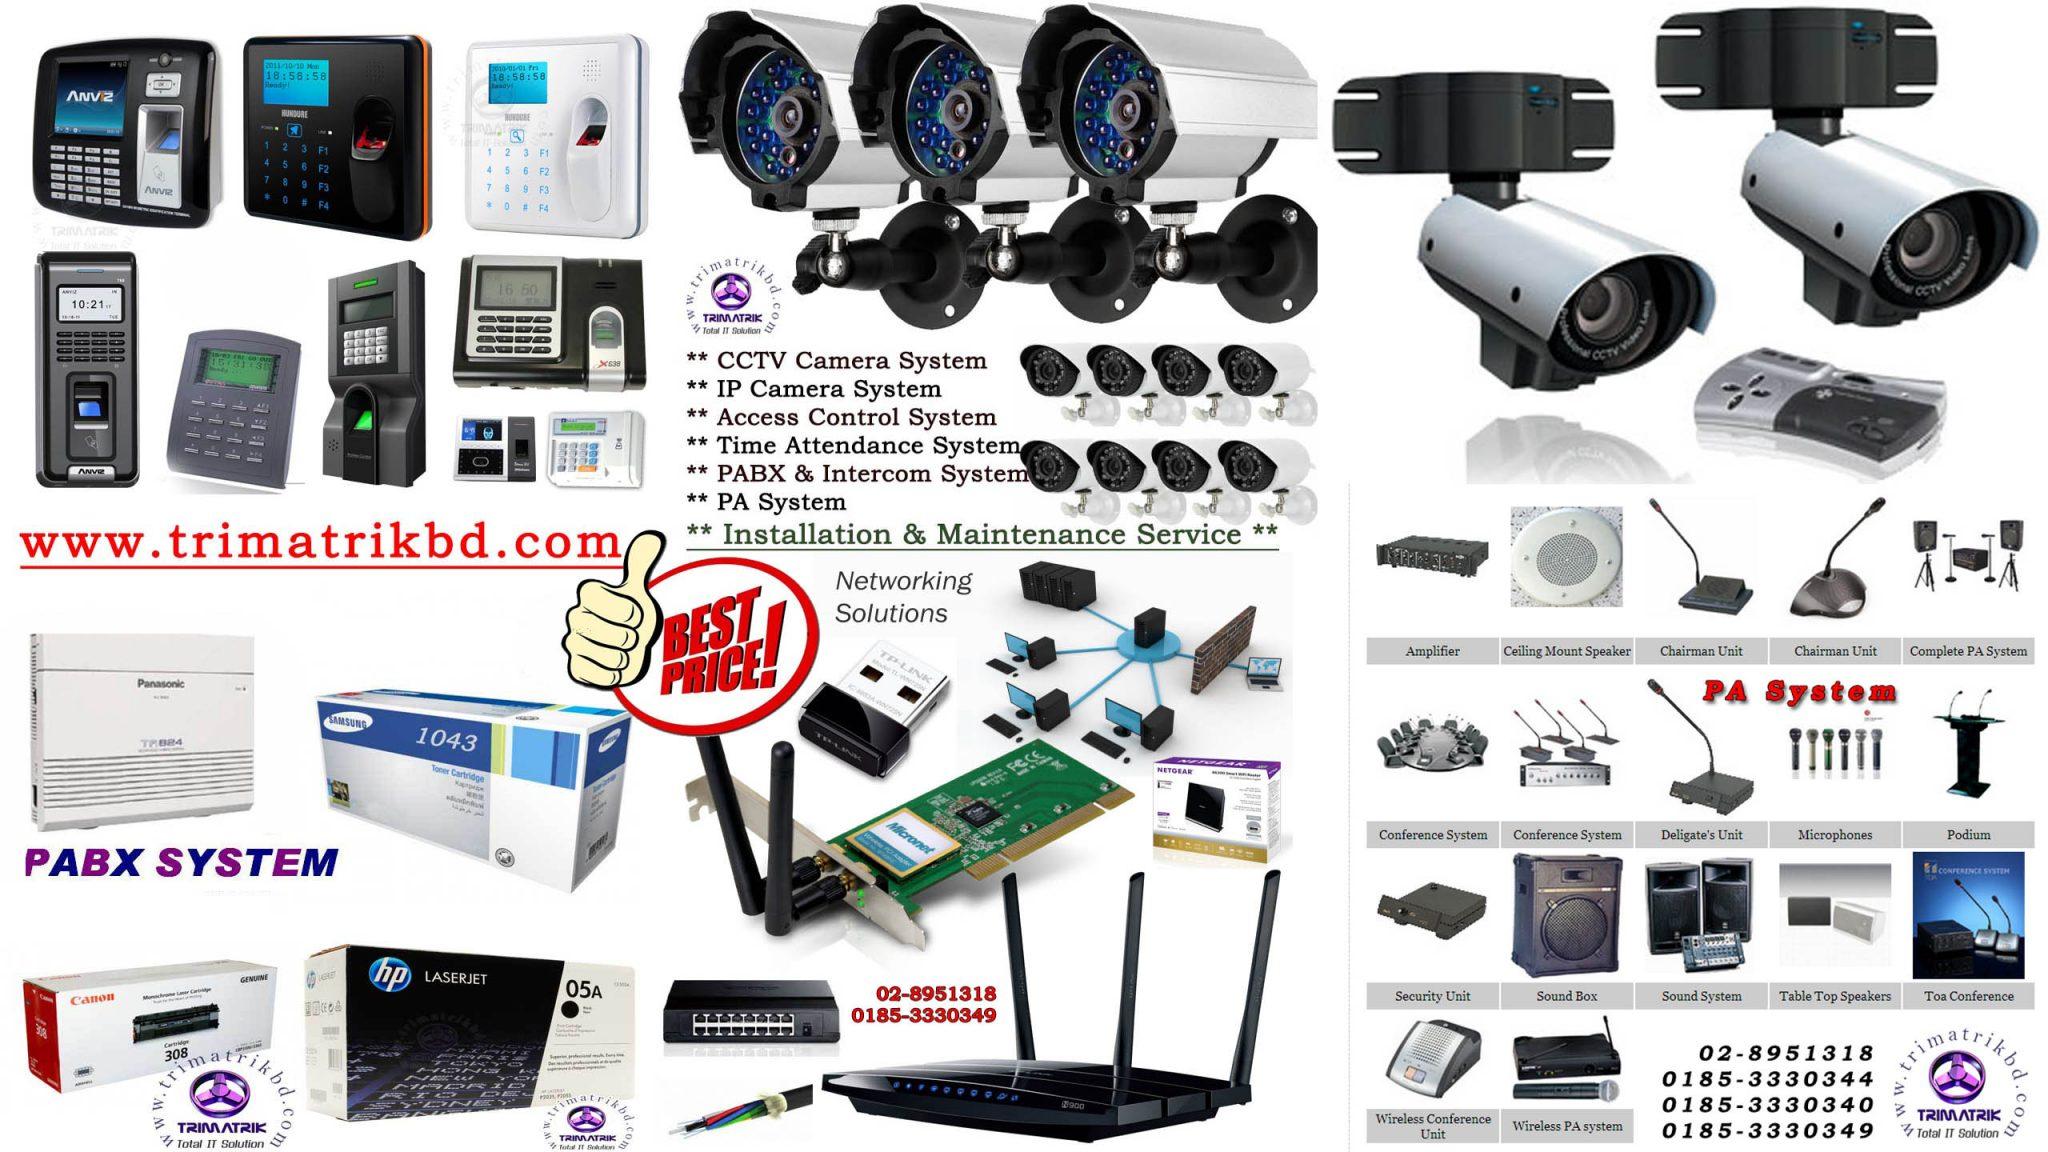 PA System Provider in Bangladesh, PA System Price in Bangladesh, TOA, BOSCH, AHUJA, HTDZ, ITC,Column Speaker,Ceiling Speaker,Amplifier Bangladesh,Microphone